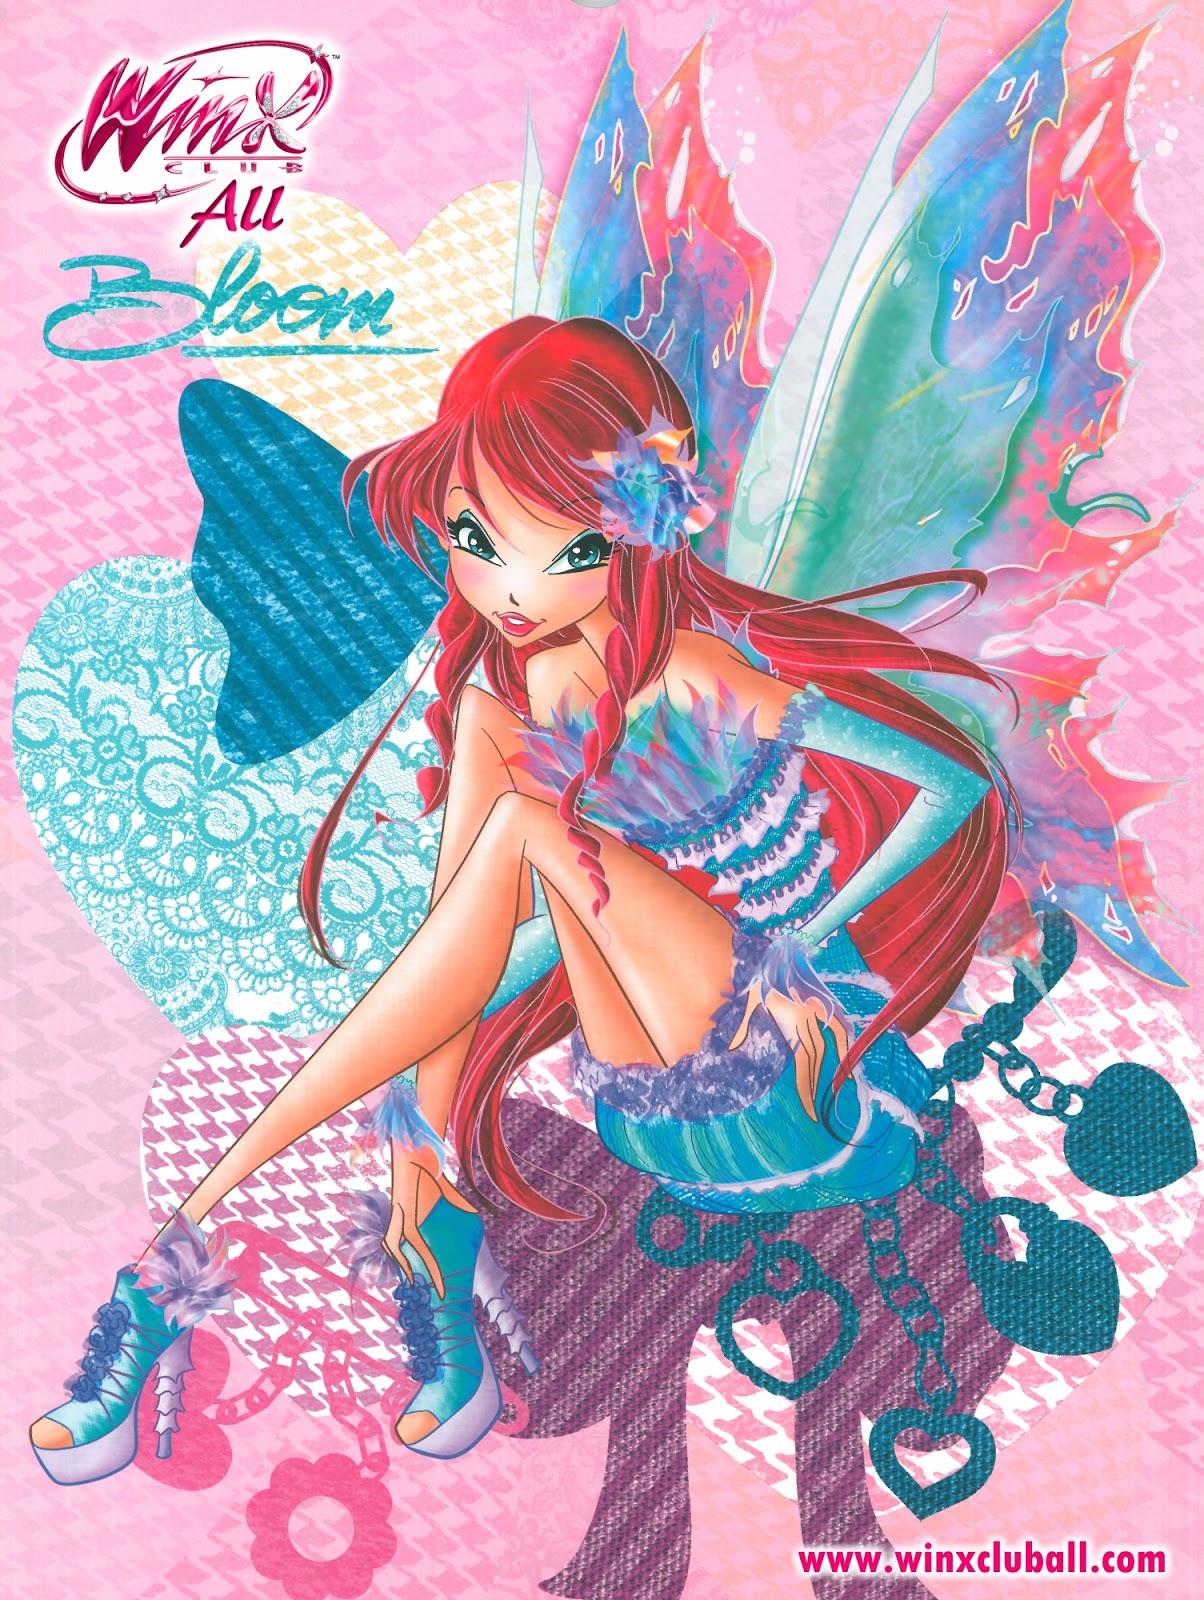 Bloom Mythix Wallpaper!